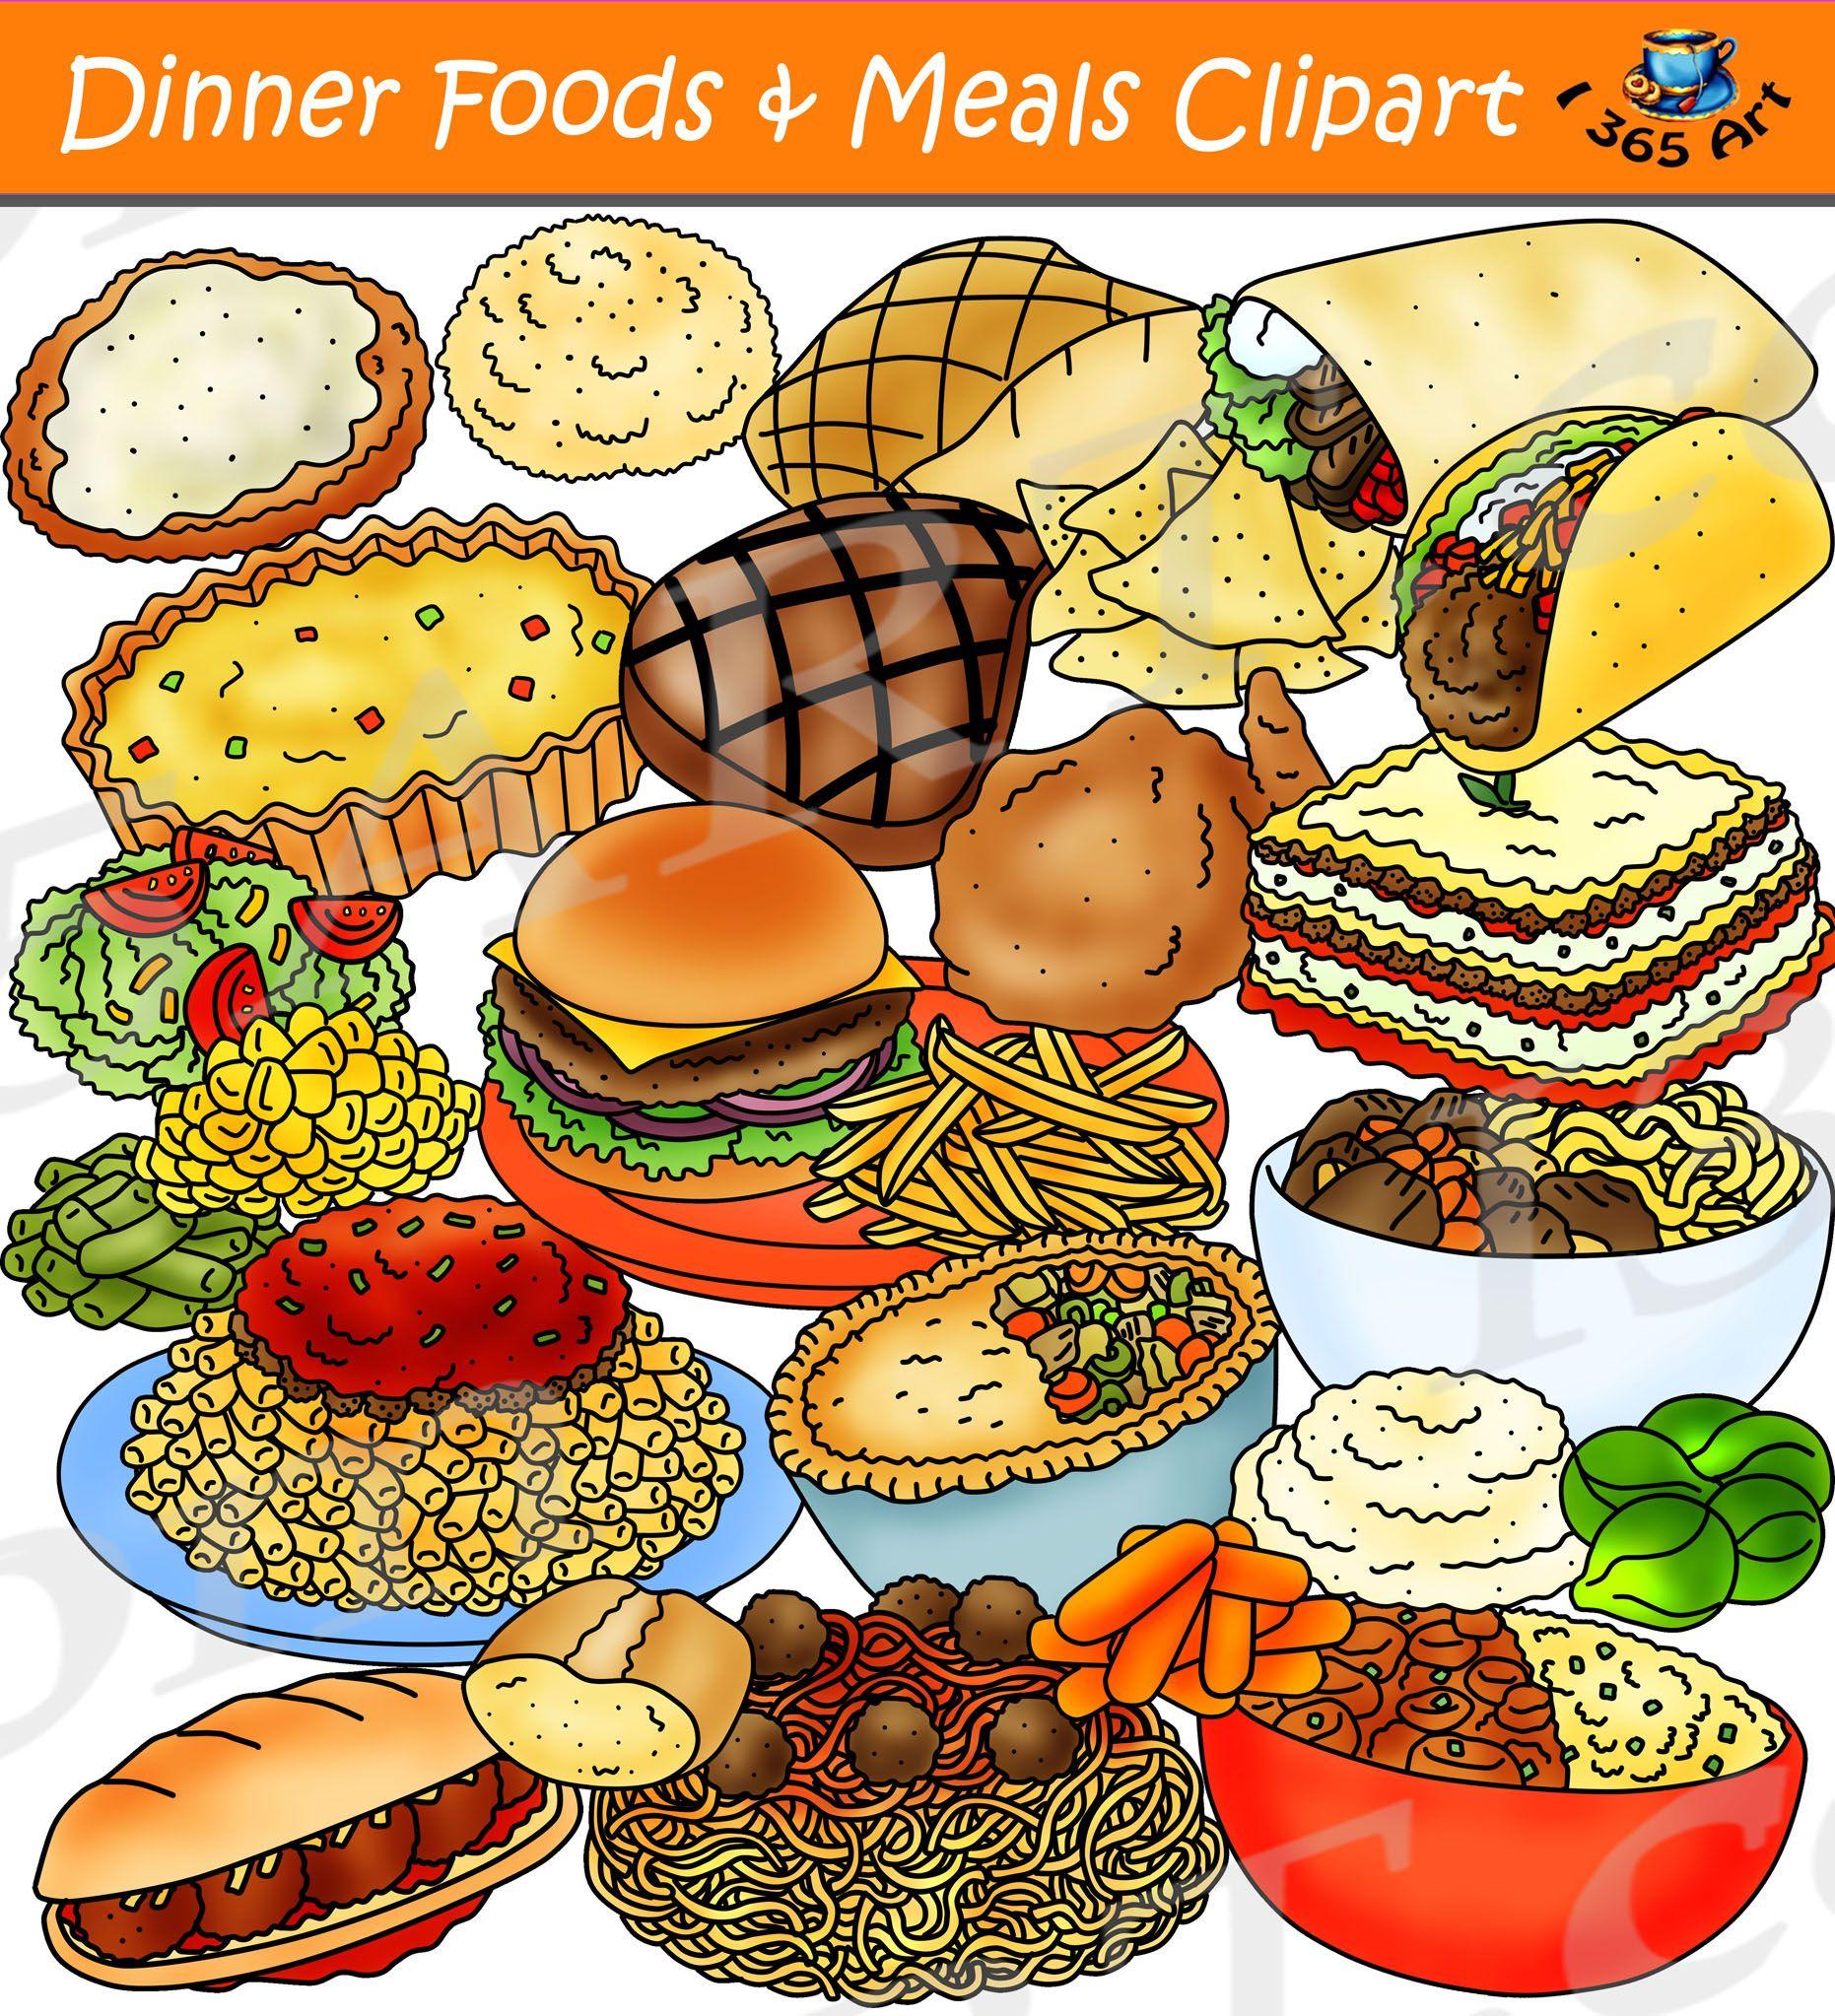 Dinner Foods Clipart Dinner Meals Clipart Download Clipart 4 School Food Clipart Easy Chicken Dinner Recipes Dinner Recipes